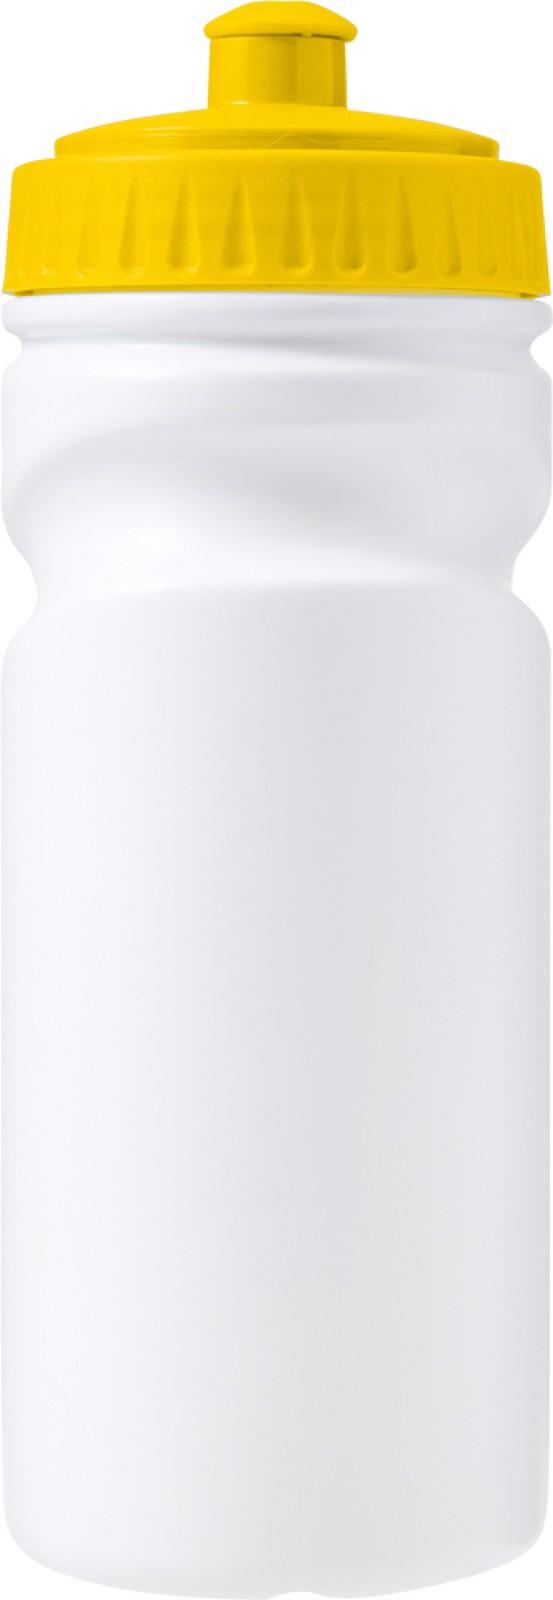 HDPE bottle - Yellow